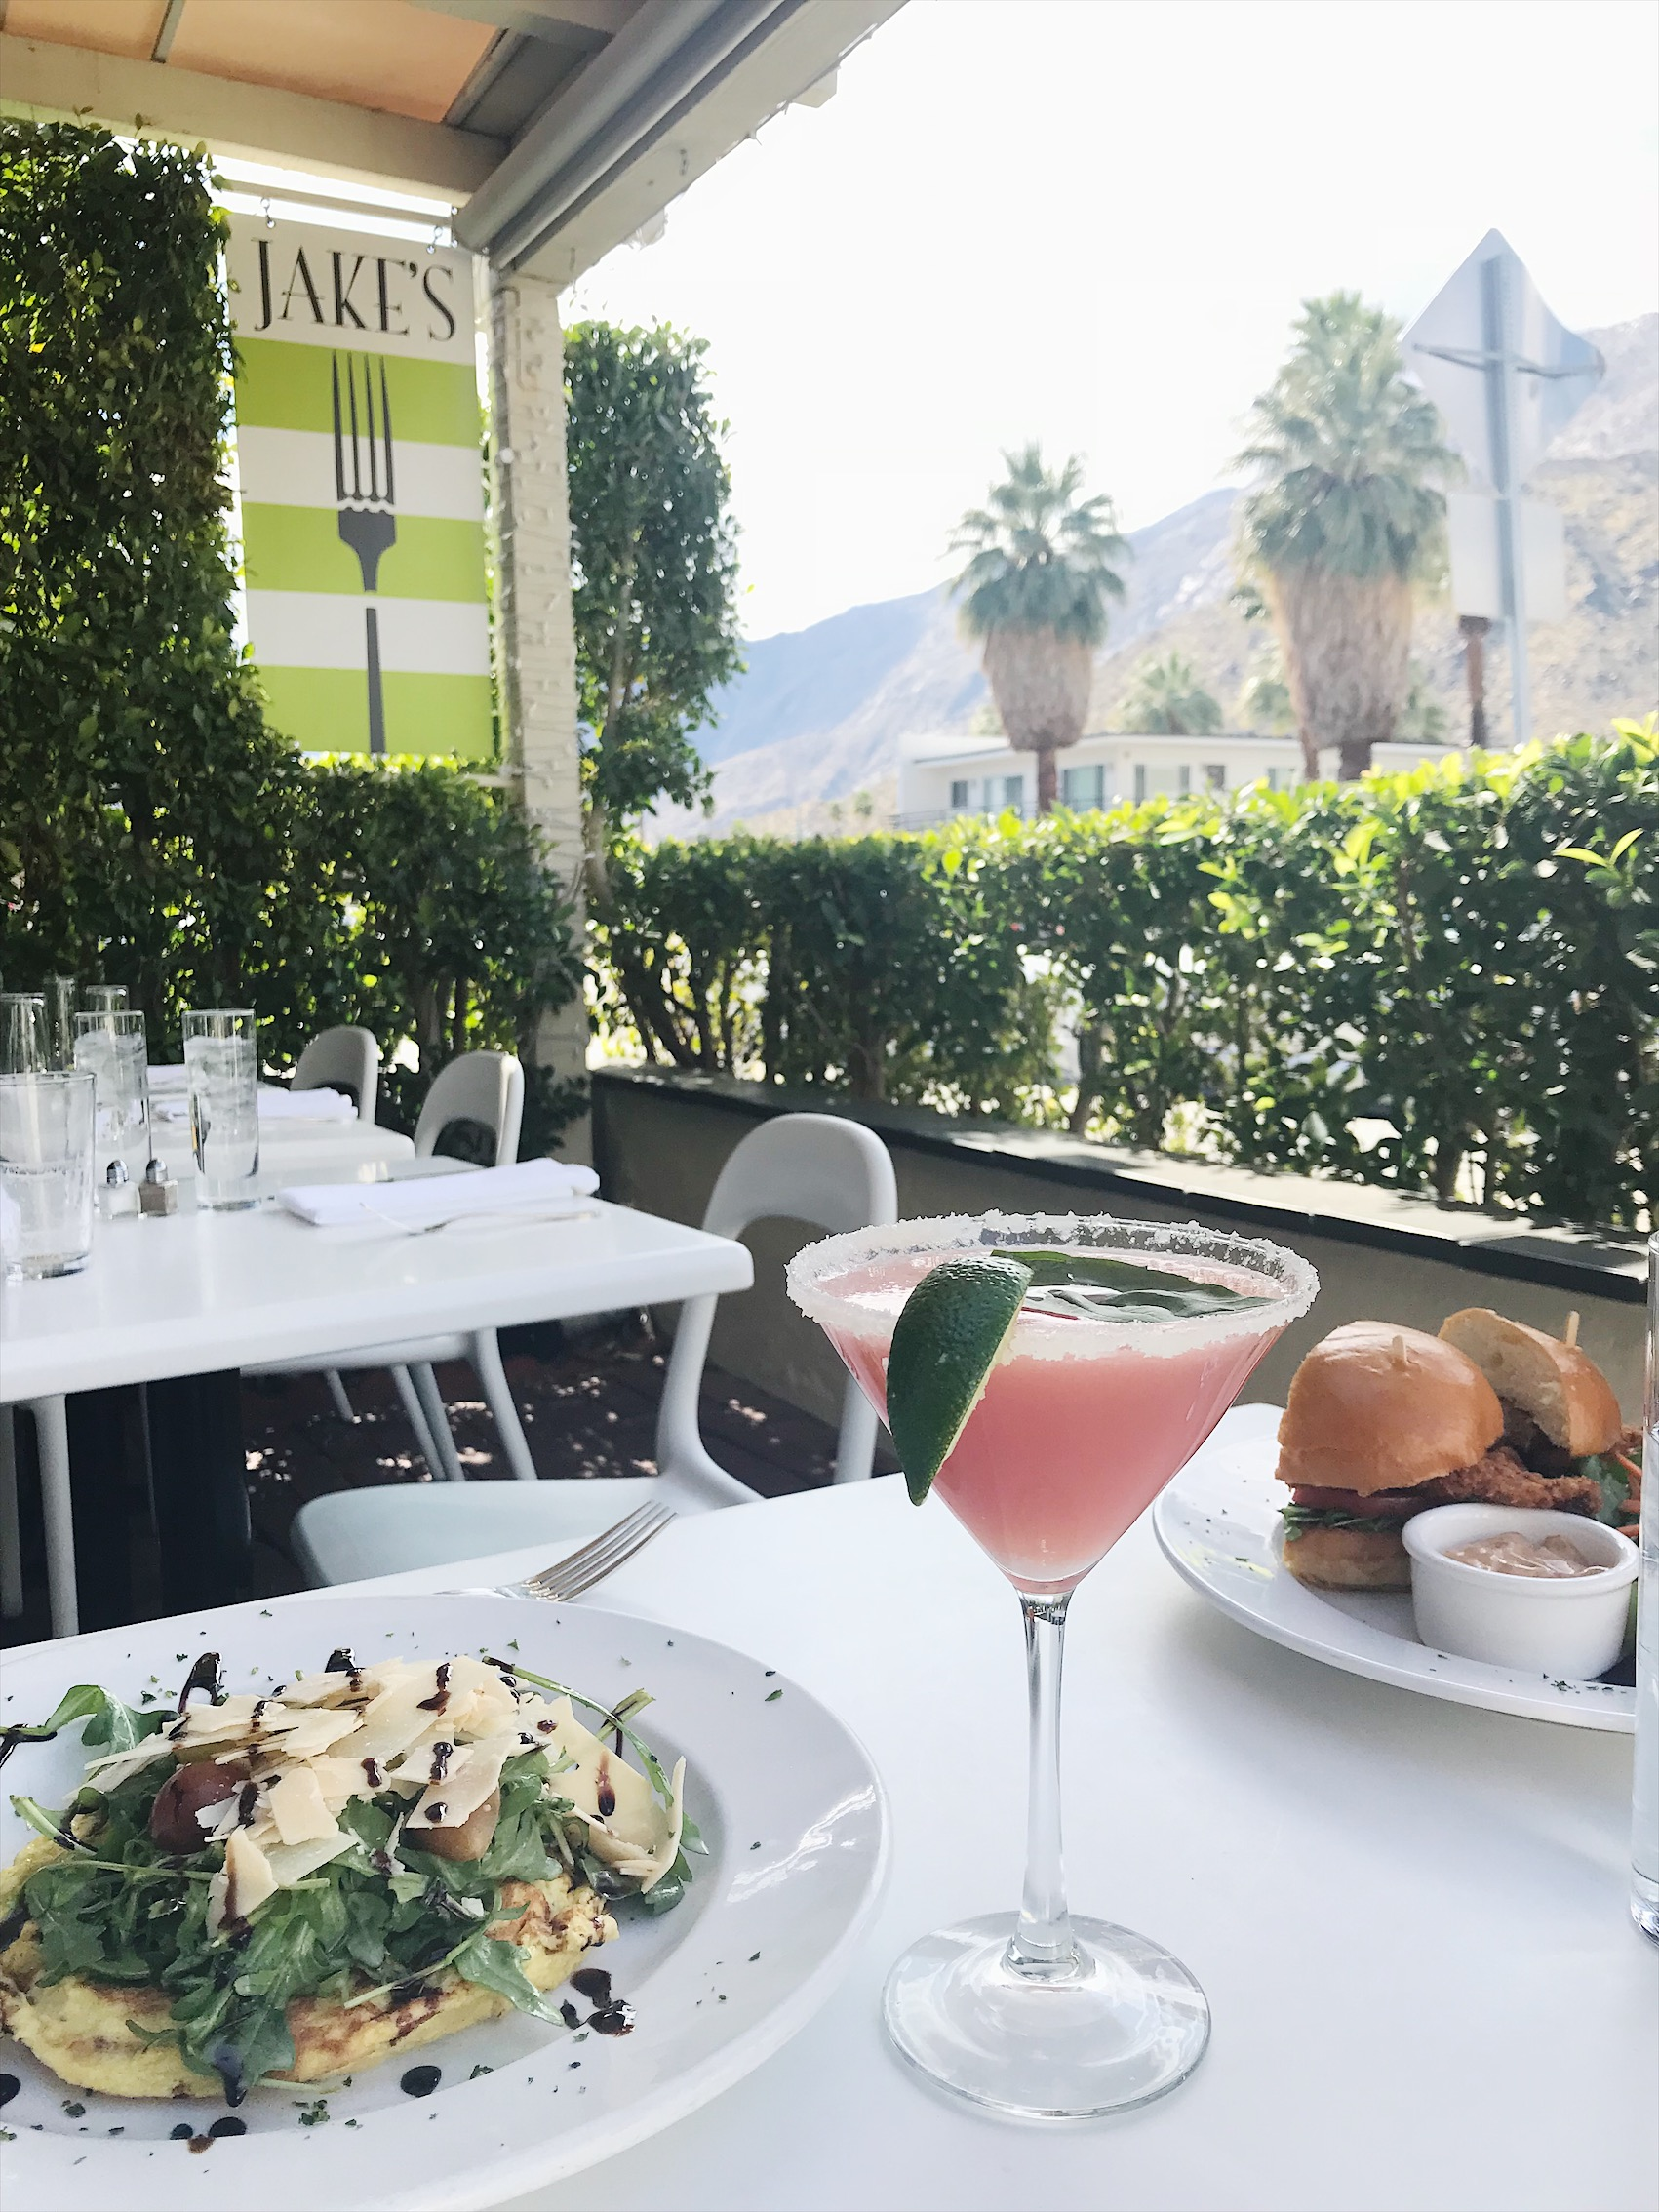 Jakes Palm Springs brunch